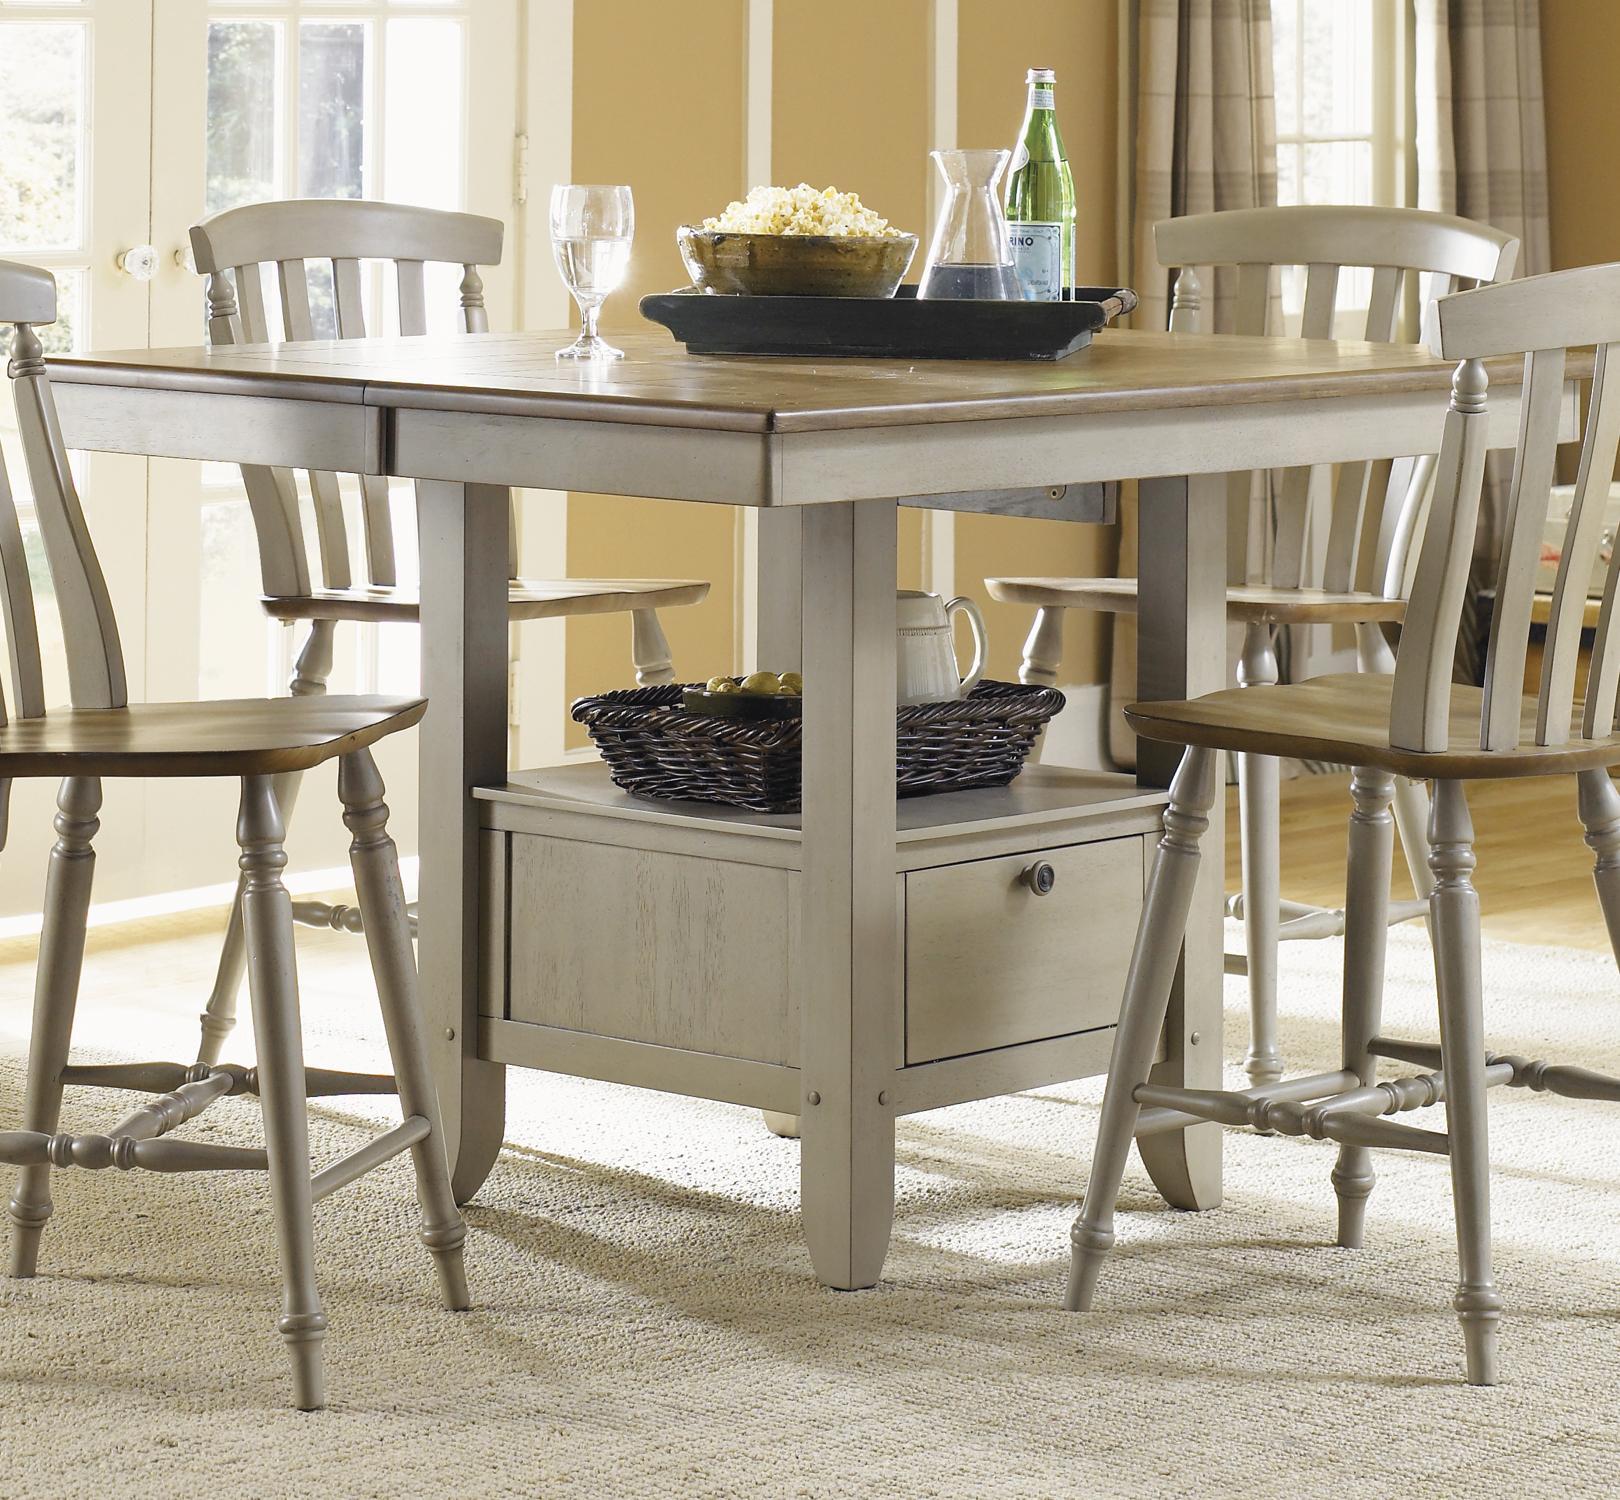 Al Fresco Gathering Table by Liberty Furniture at Lapeer Furniture & Mattress Center